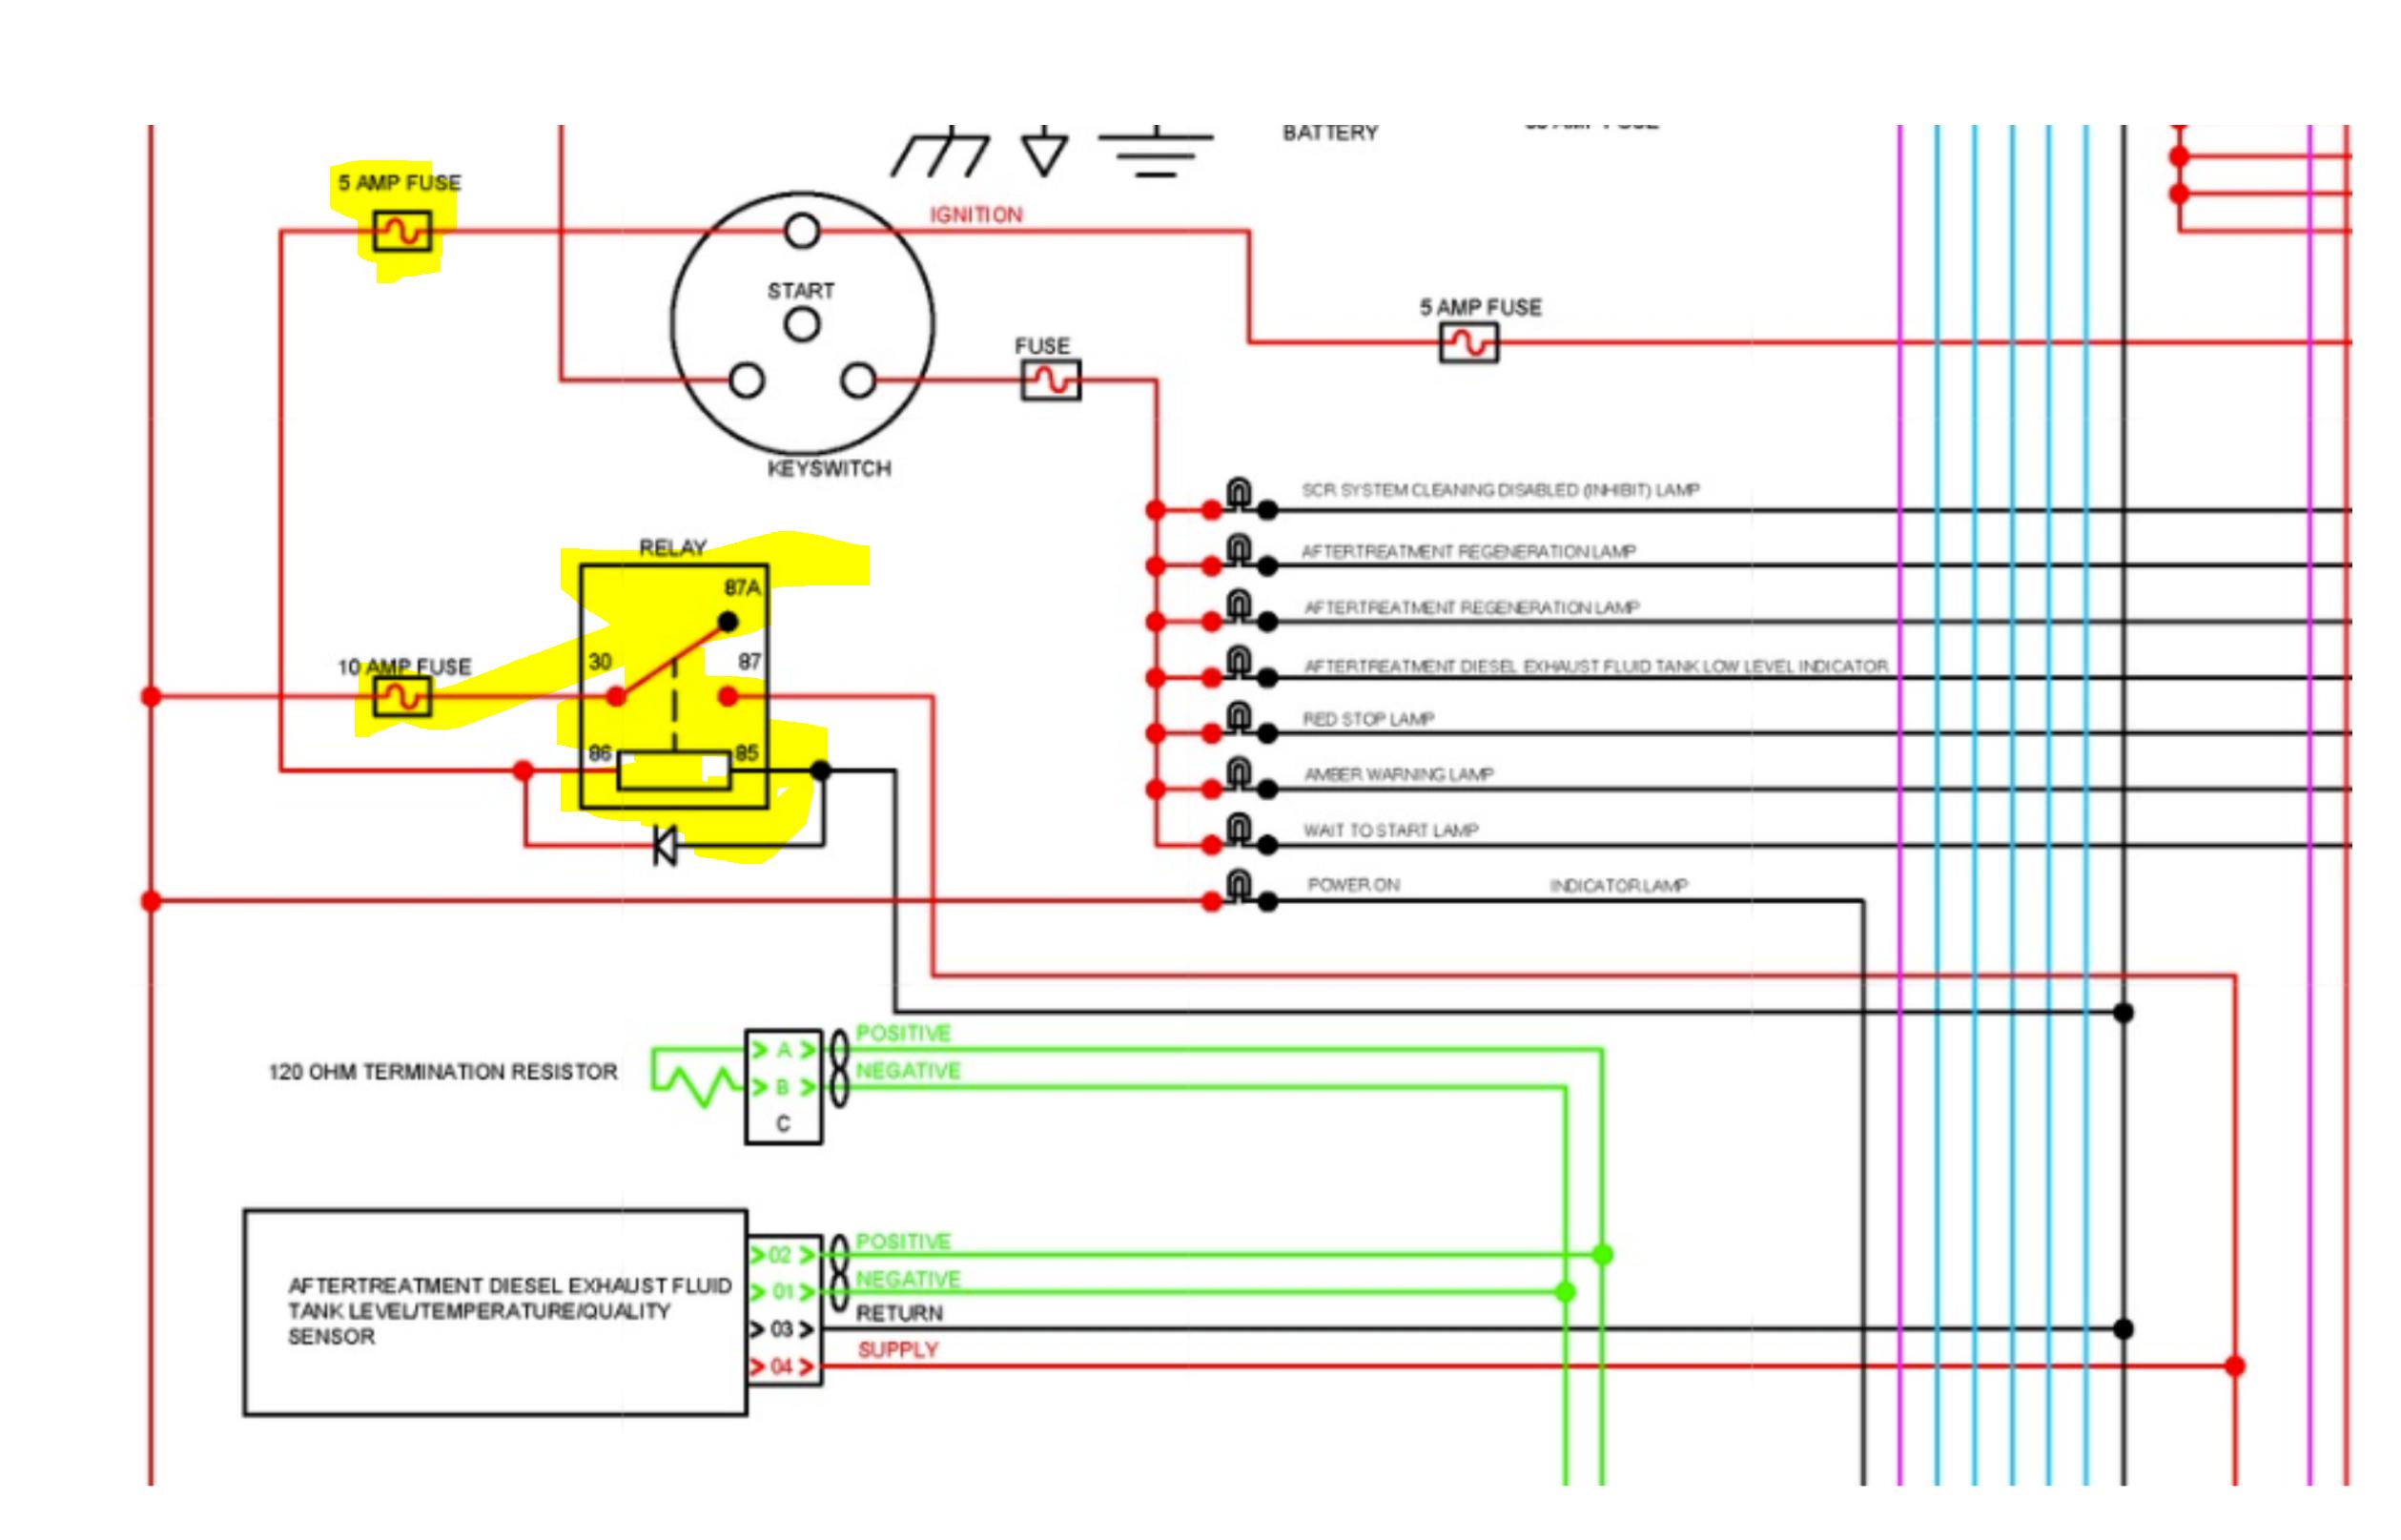 [DIAGRAM_38ZD]  9 active codes on qsb 6.7 Cummins. Kalmar Ottawa t2. Manual regen was  stopped midway | Ottawa Fuse Box |  | JustAnswer